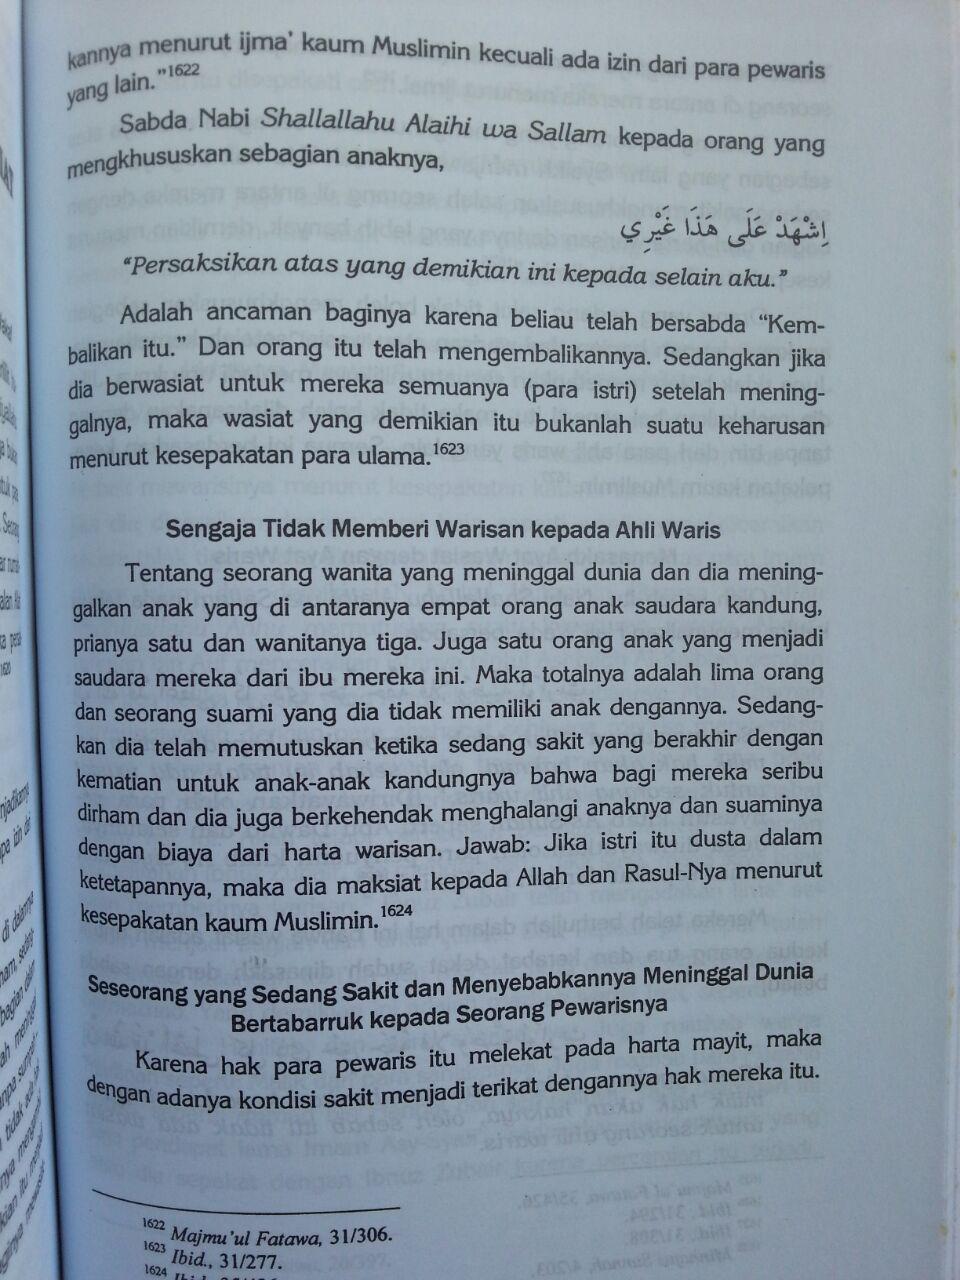 Buku Ensiklopedi Ijma Syaikhul Islam Ibnu Taimiyah isi 4